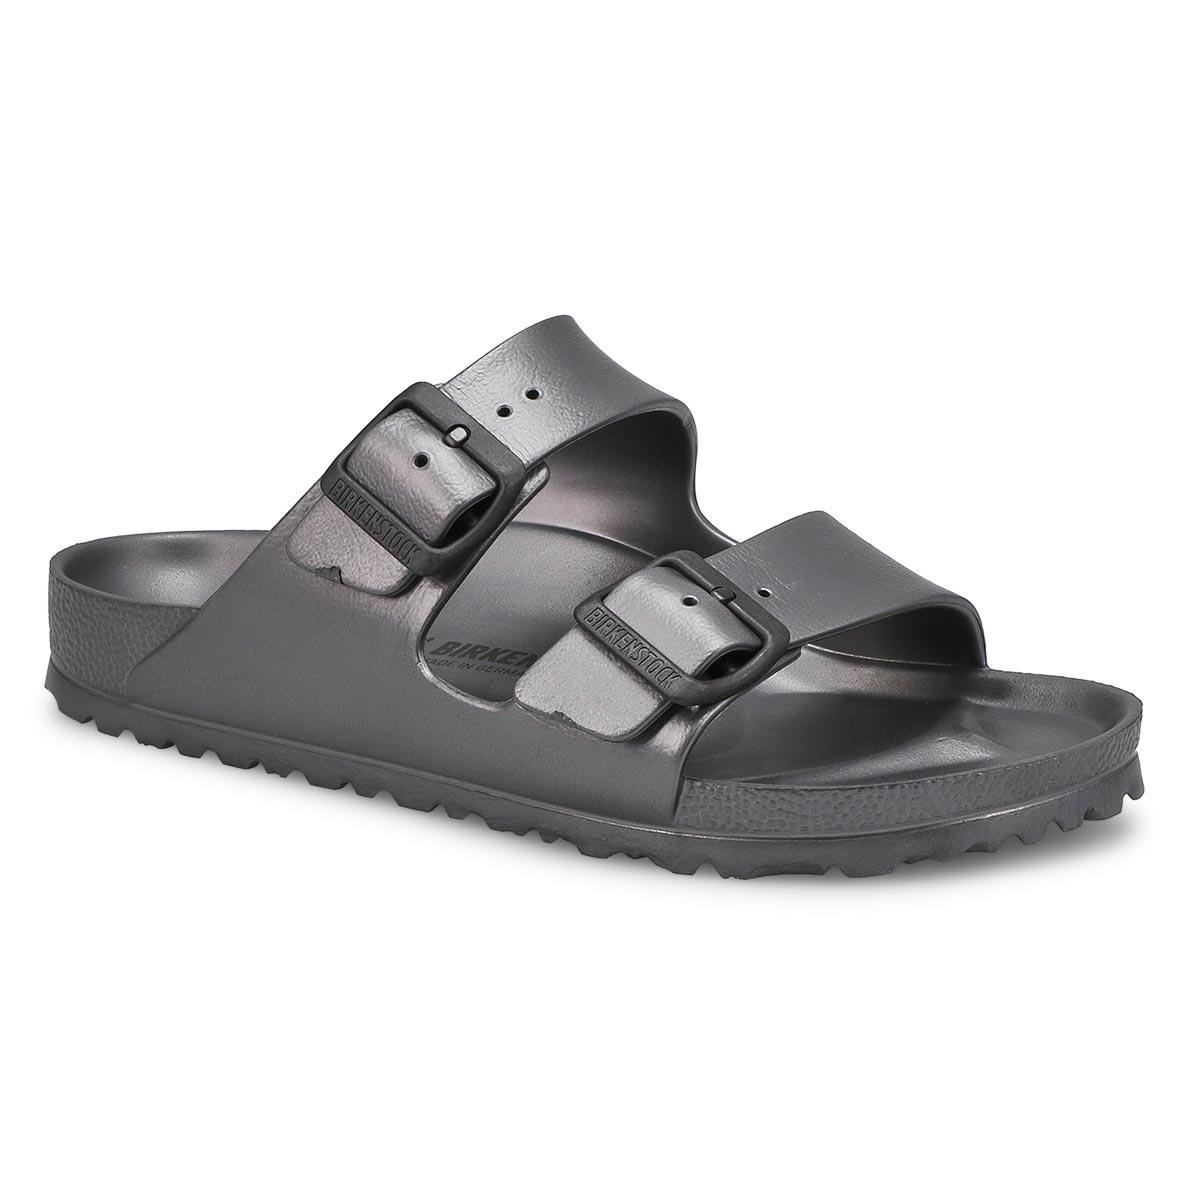 Women's ARIZONA metallic anthracite EVA sandals